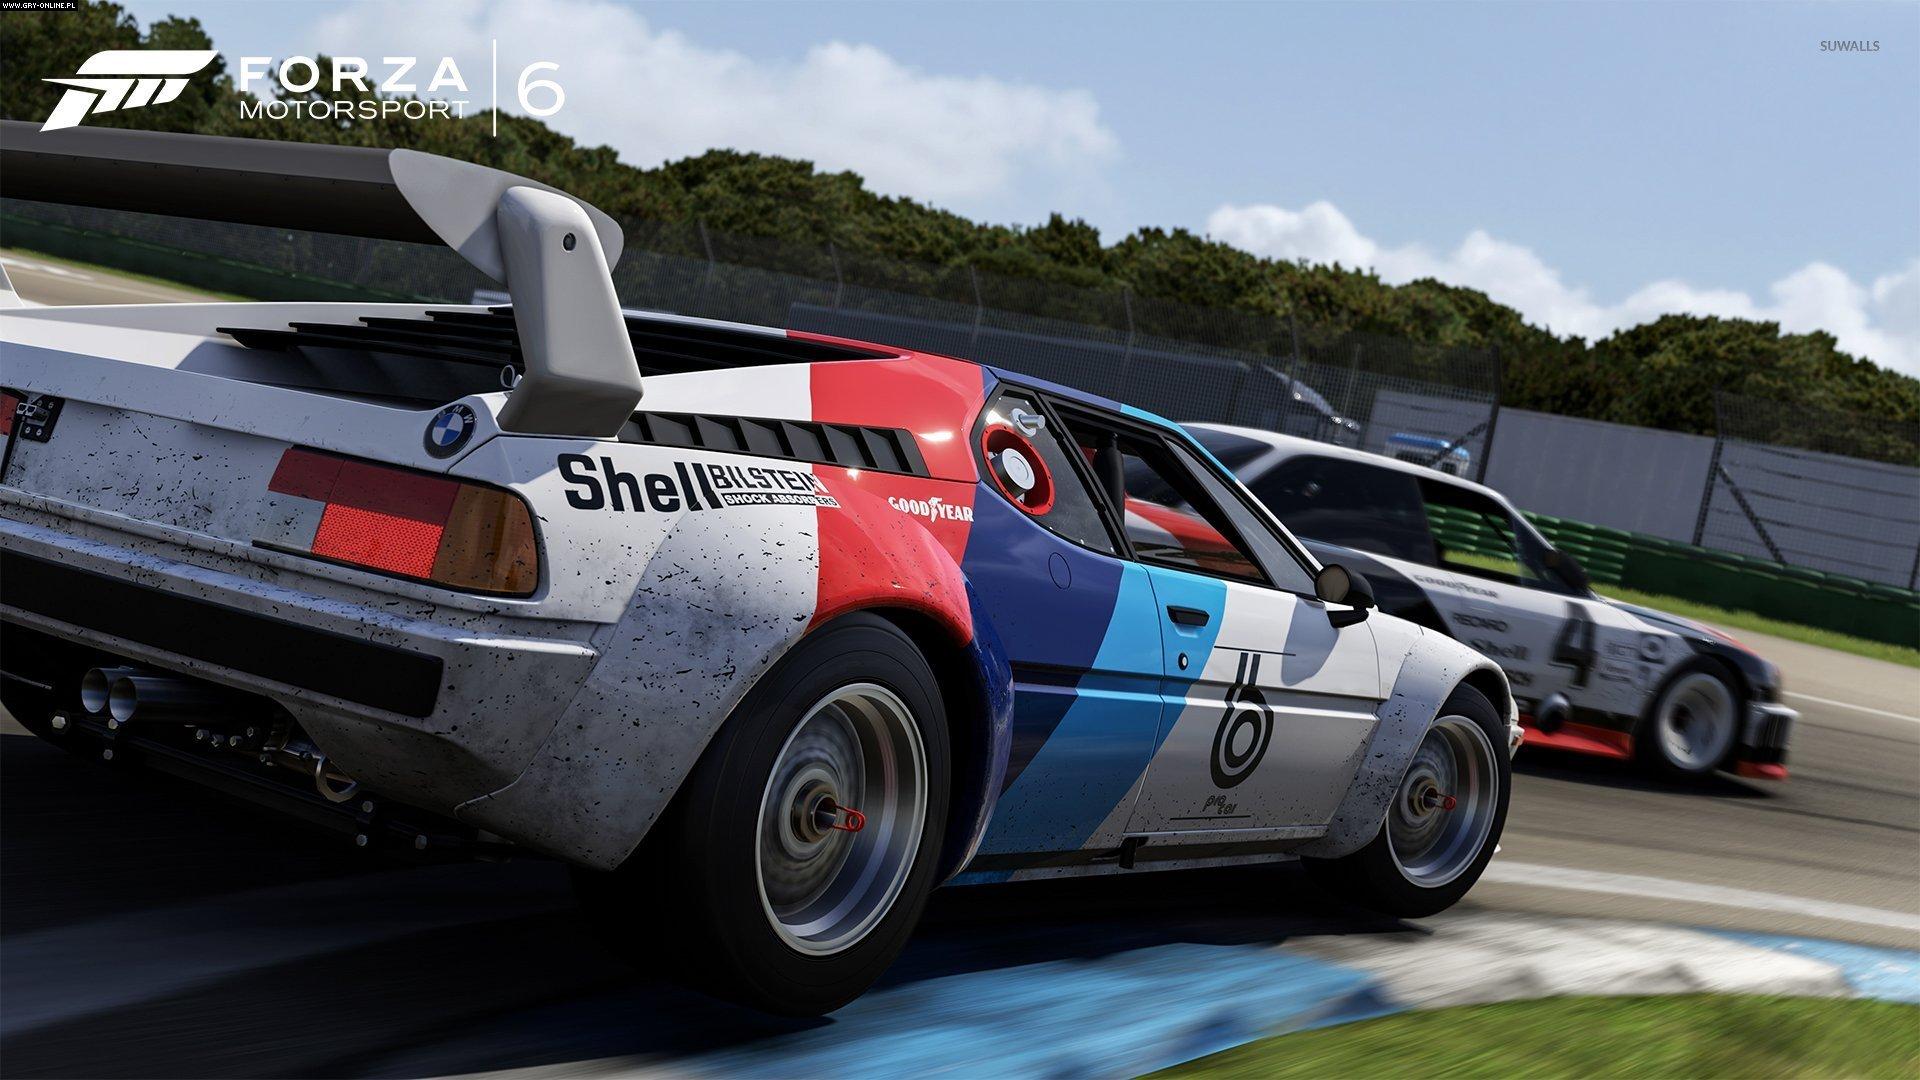 Forza Motorsport 6 7 Wallpaper Game Wallpapers 49035